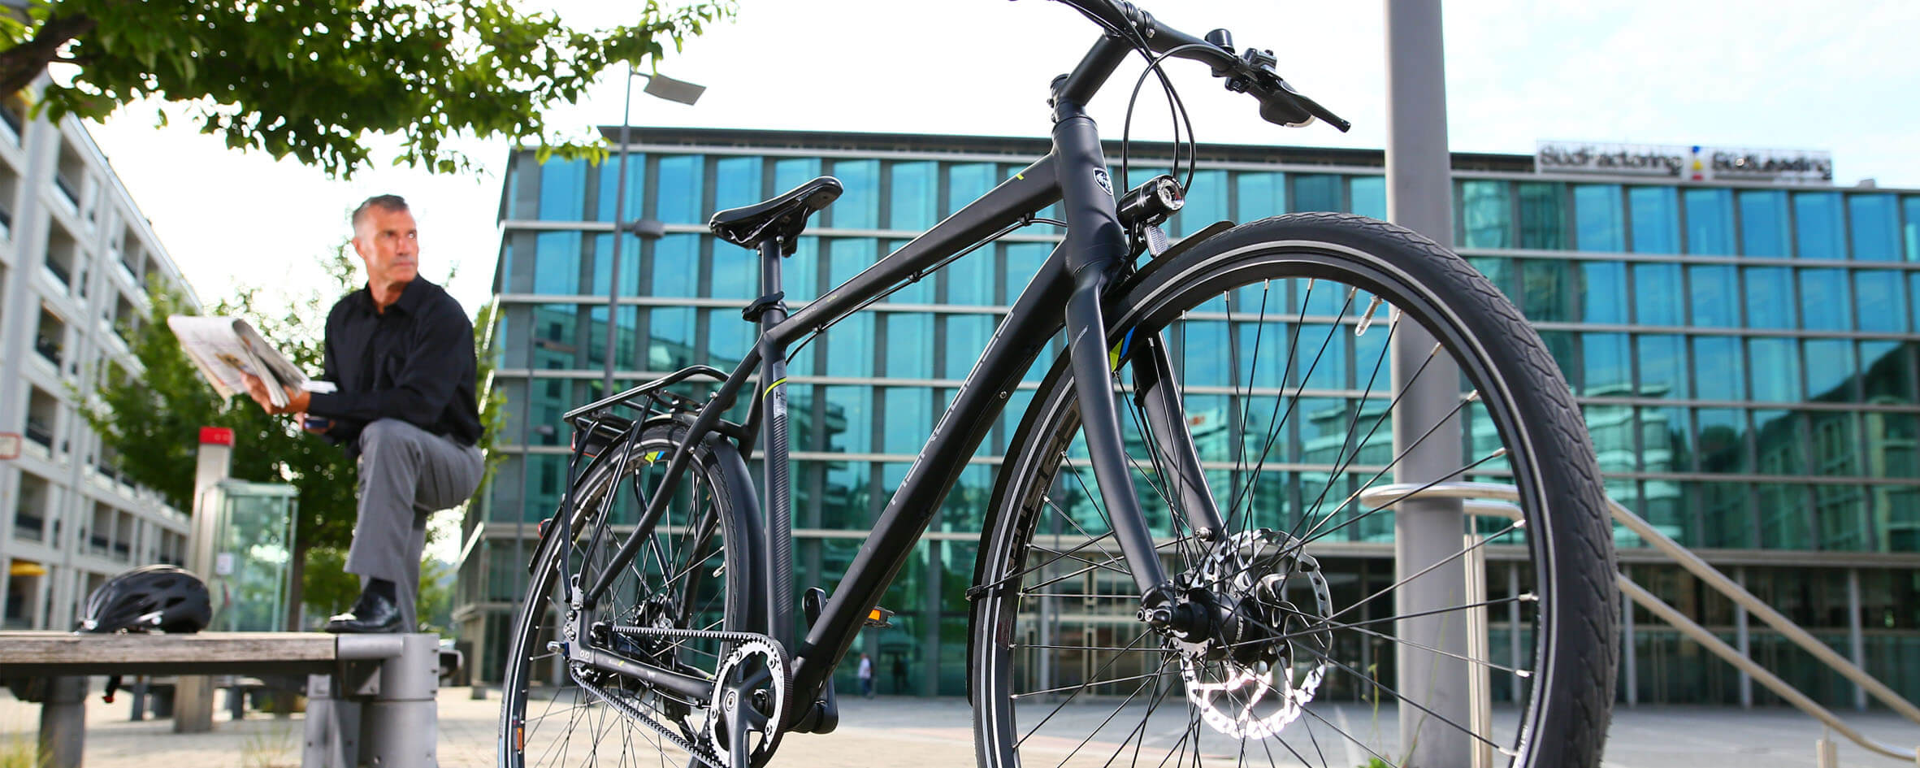 fahrrad fahrrad e bike zentrum schreiber. Black Bedroom Furniture Sets. Home Design Ideas